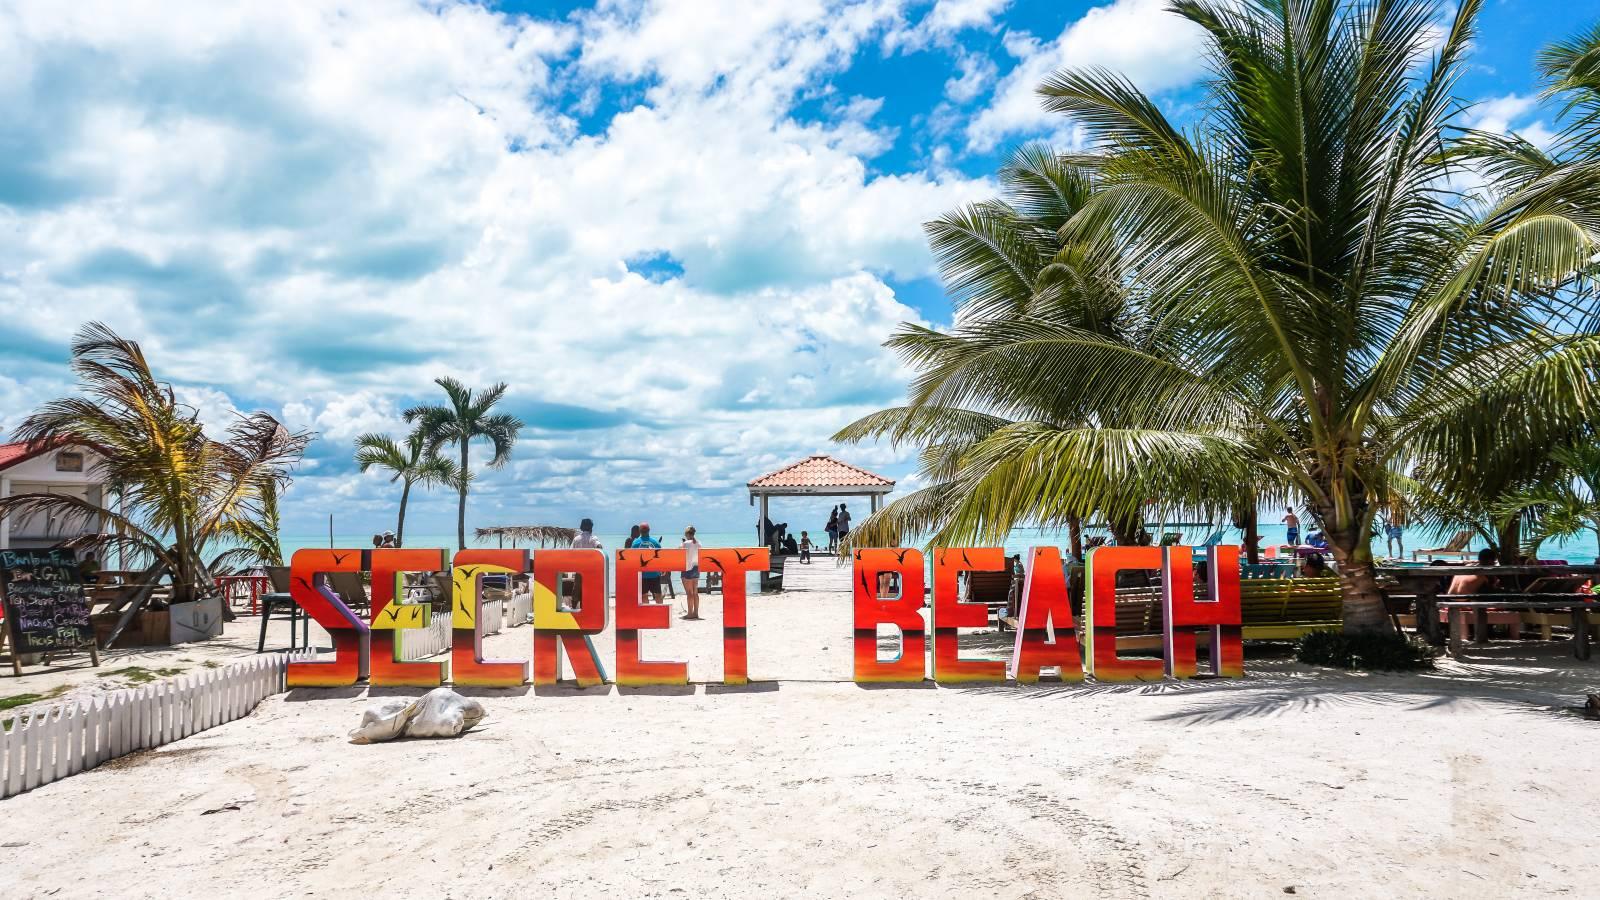 saturday - july 27 - 11:30am - secret beach (yes! that's the actual name…)11:30pm - Jaguar's Temple club*closes at 4am